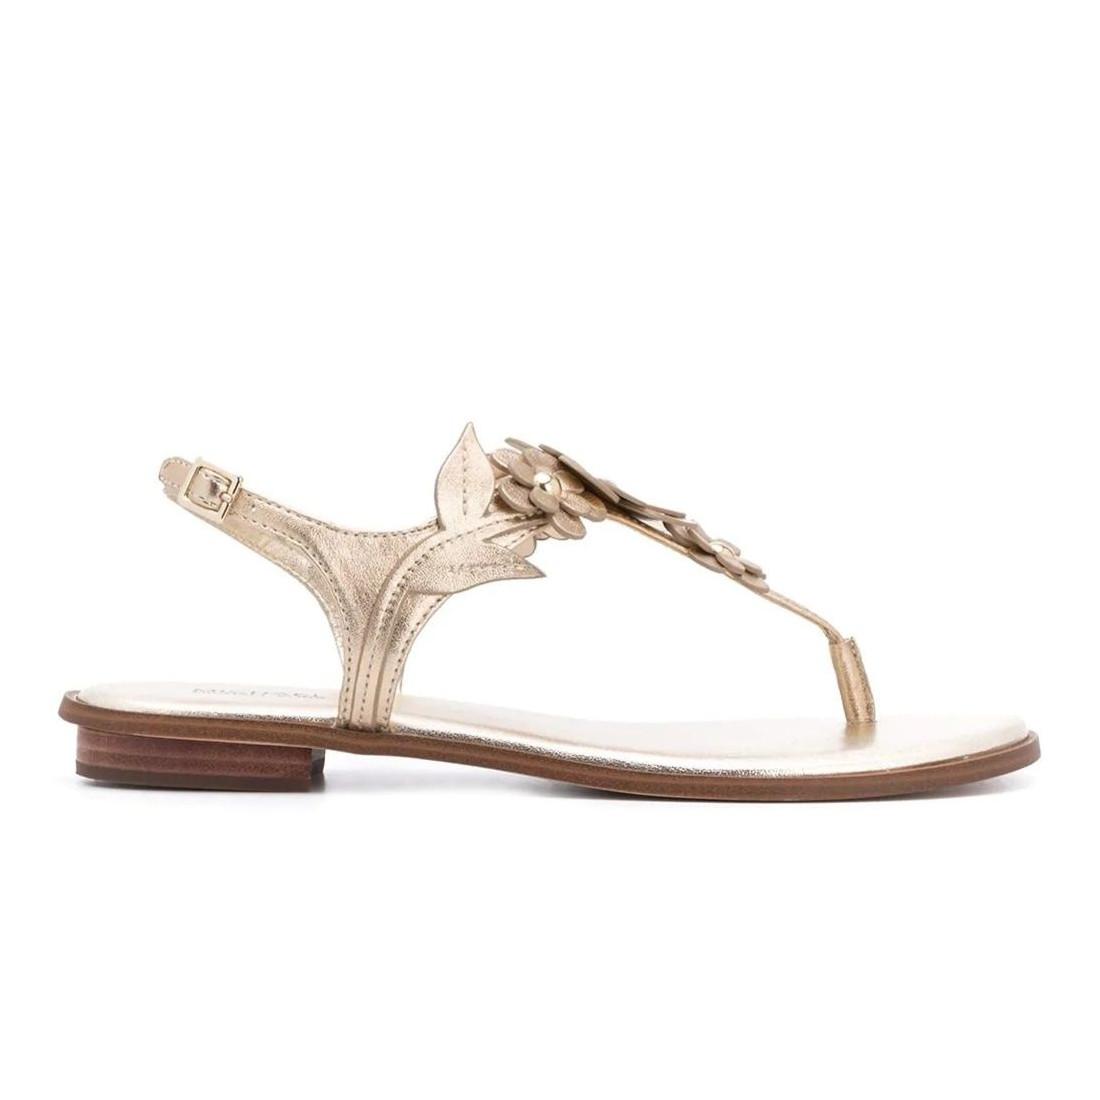 sandals woman michael kors 40s0flfa2m740 7305